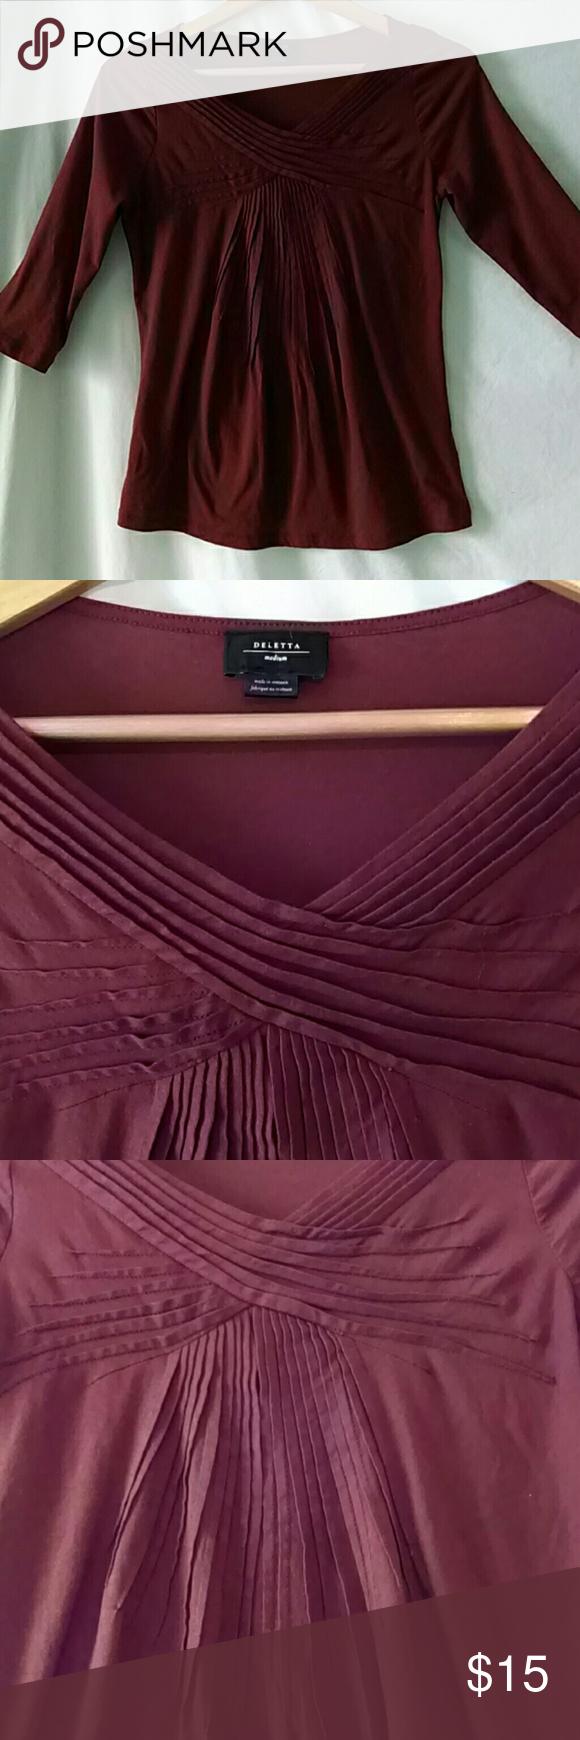 Anthropologie Deletta Cocoa Pintucked Top NWOT! Sleek & Classy Deletta Design...Pintucks all-over front. 3/4 length sleeves, NWOT! Size M Anthropologie Tops Tees - Short Sleeve